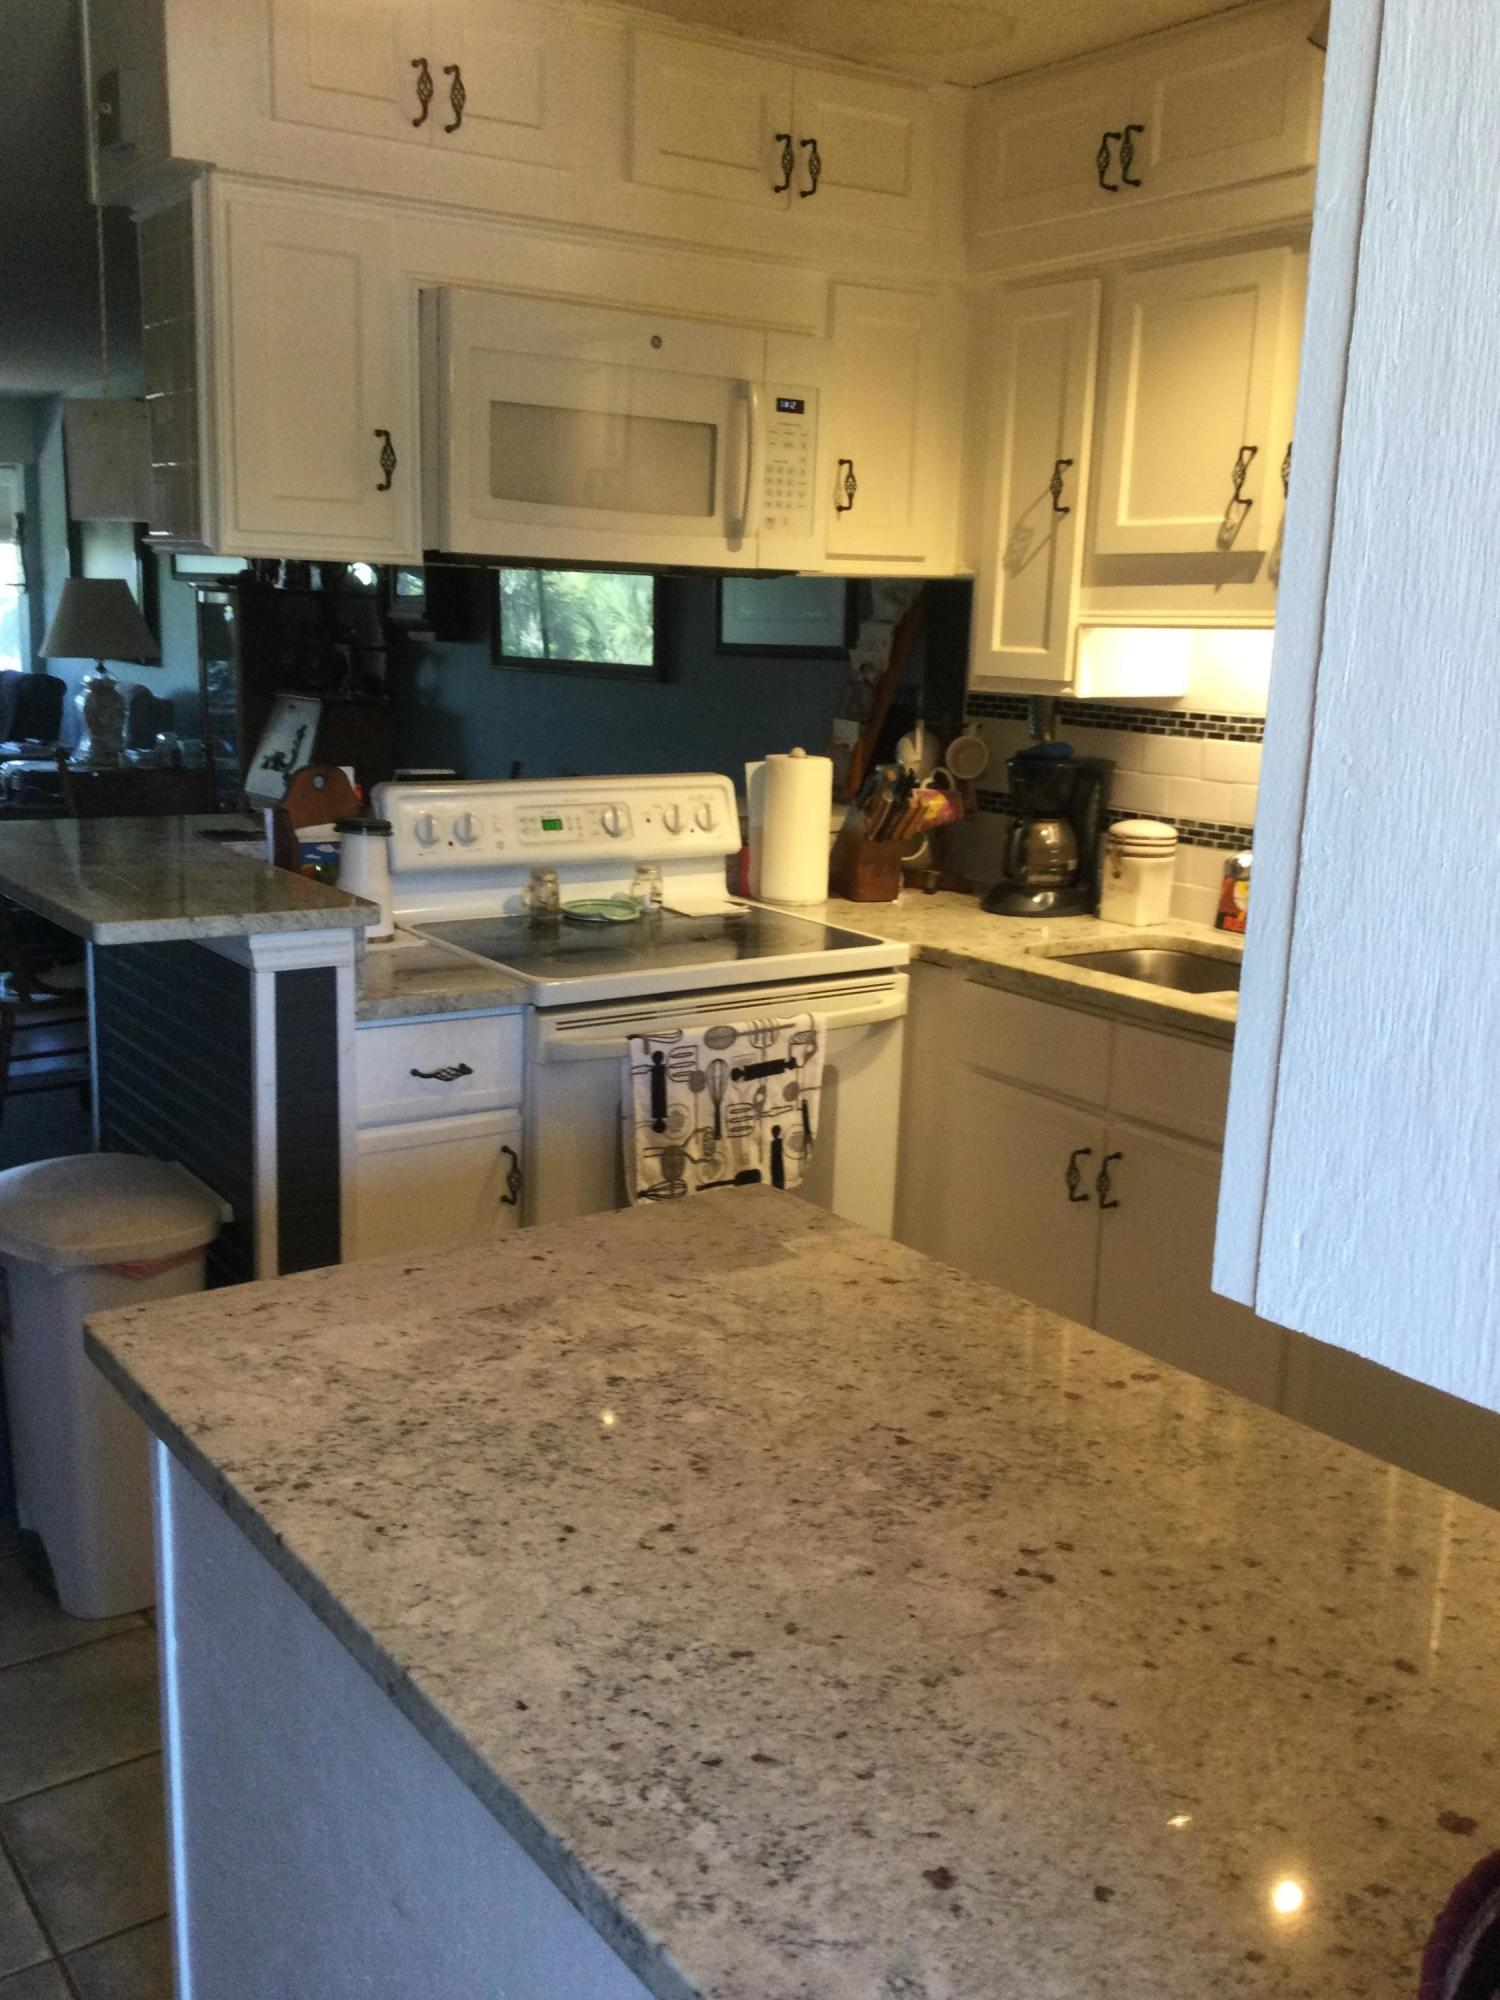 Marshview Villas Homes For Sale - 124 Mariners Cay, Folly Beach, SC - 10